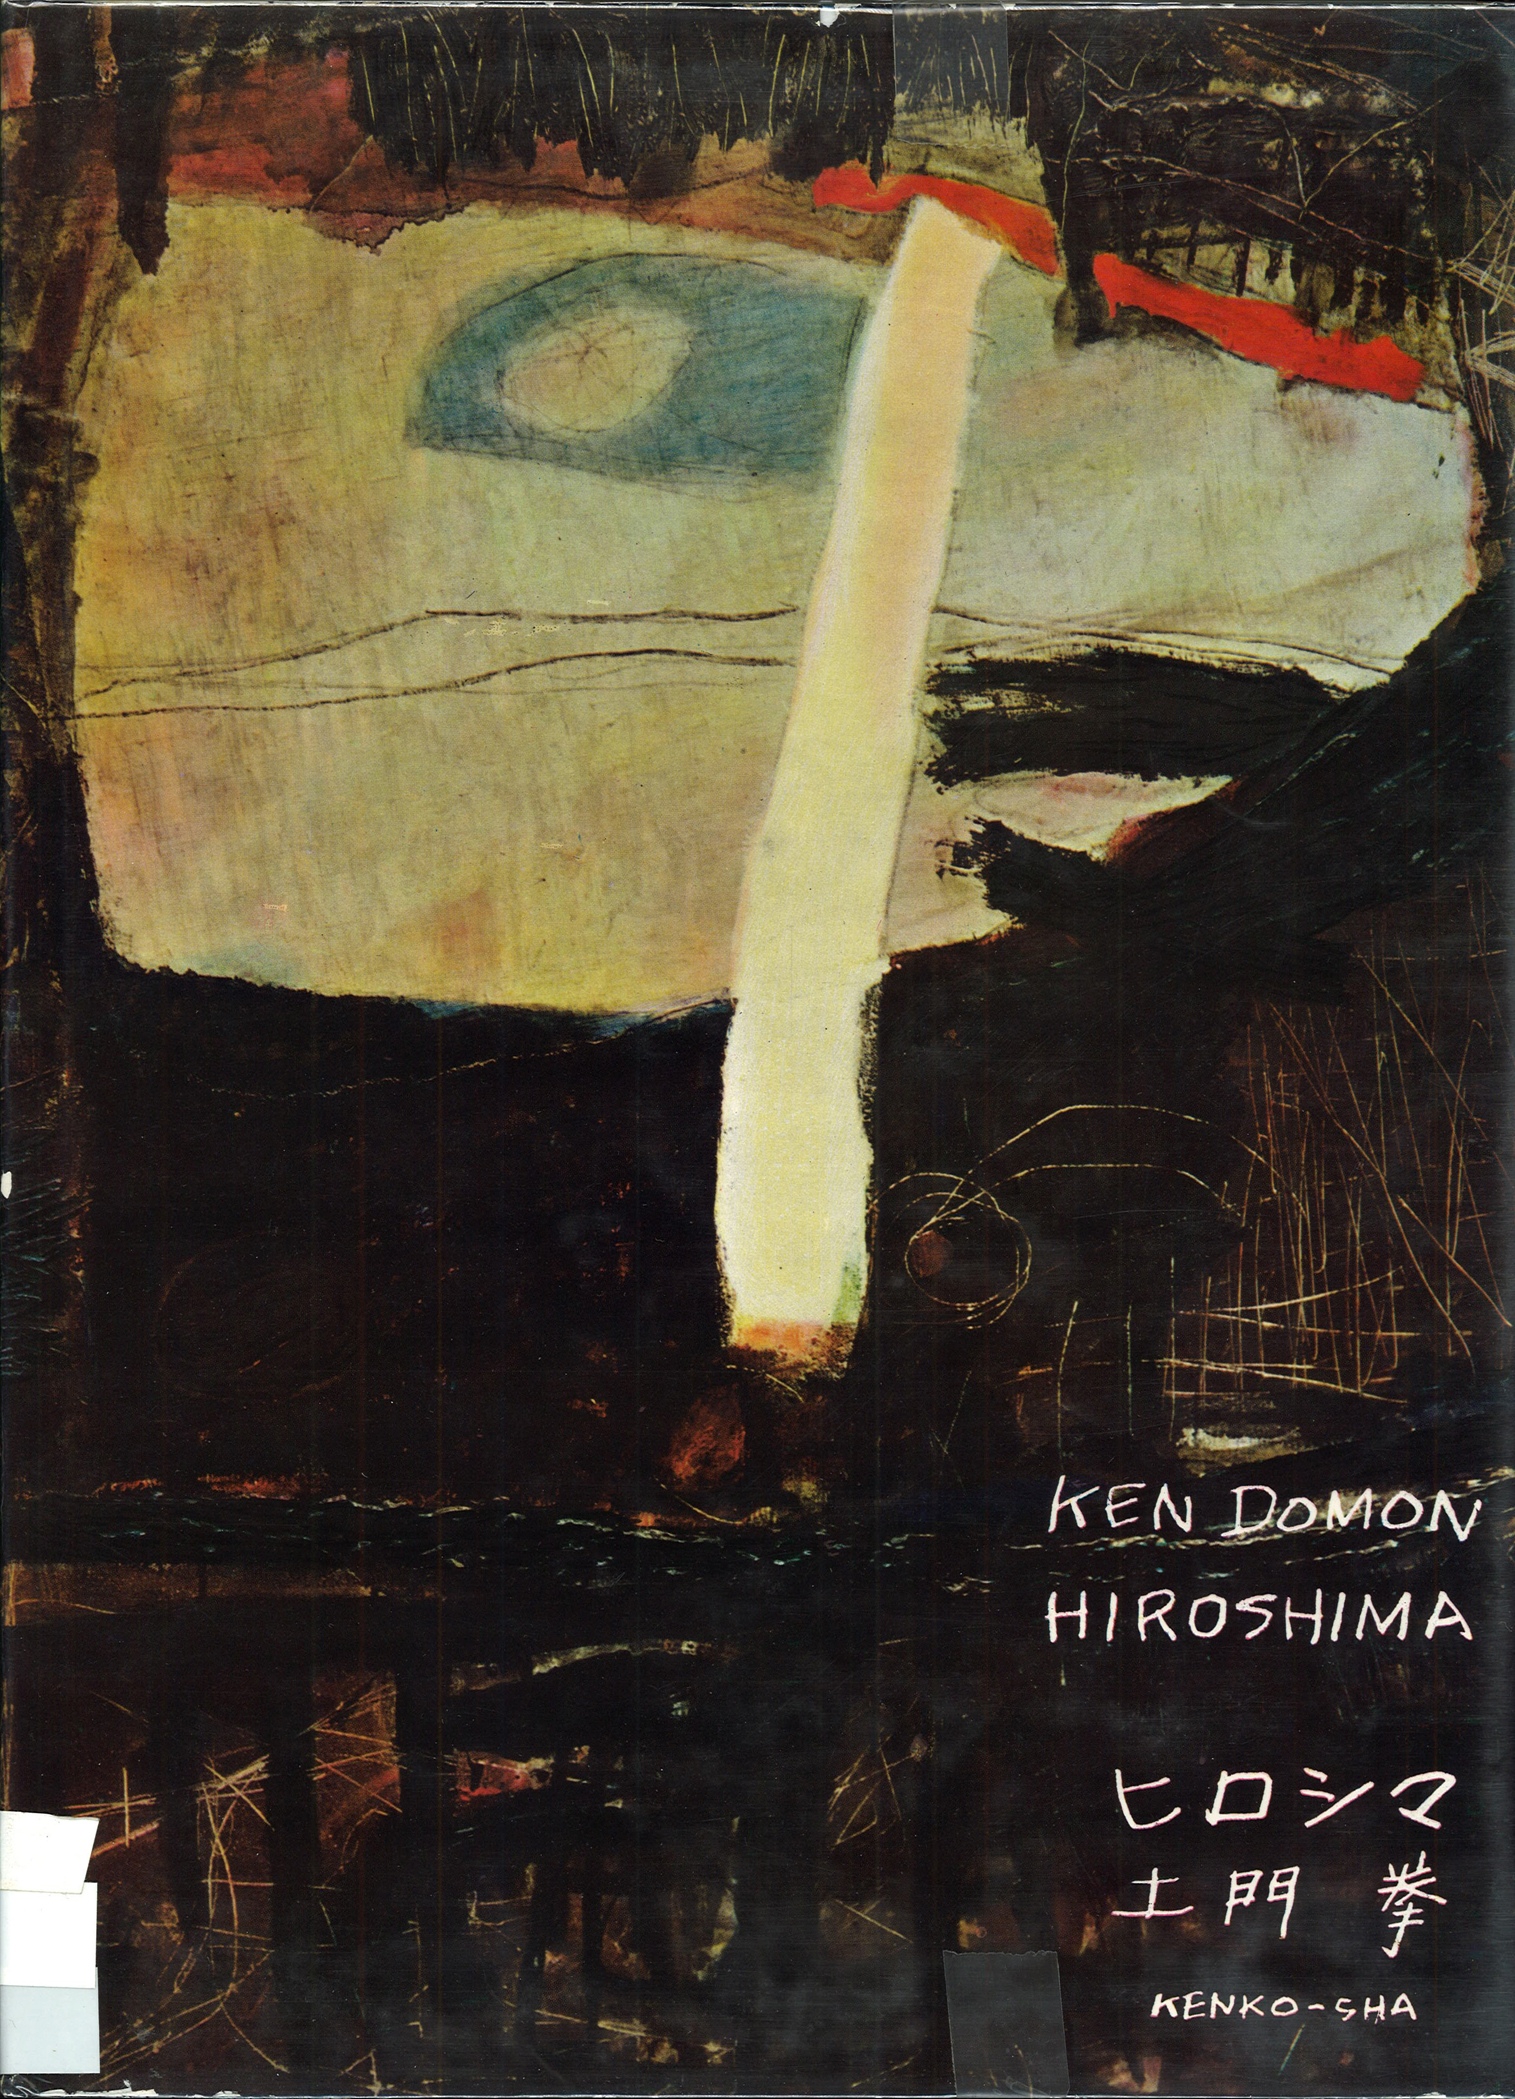 Kendomon hiroshima for Domon ken hiroshima